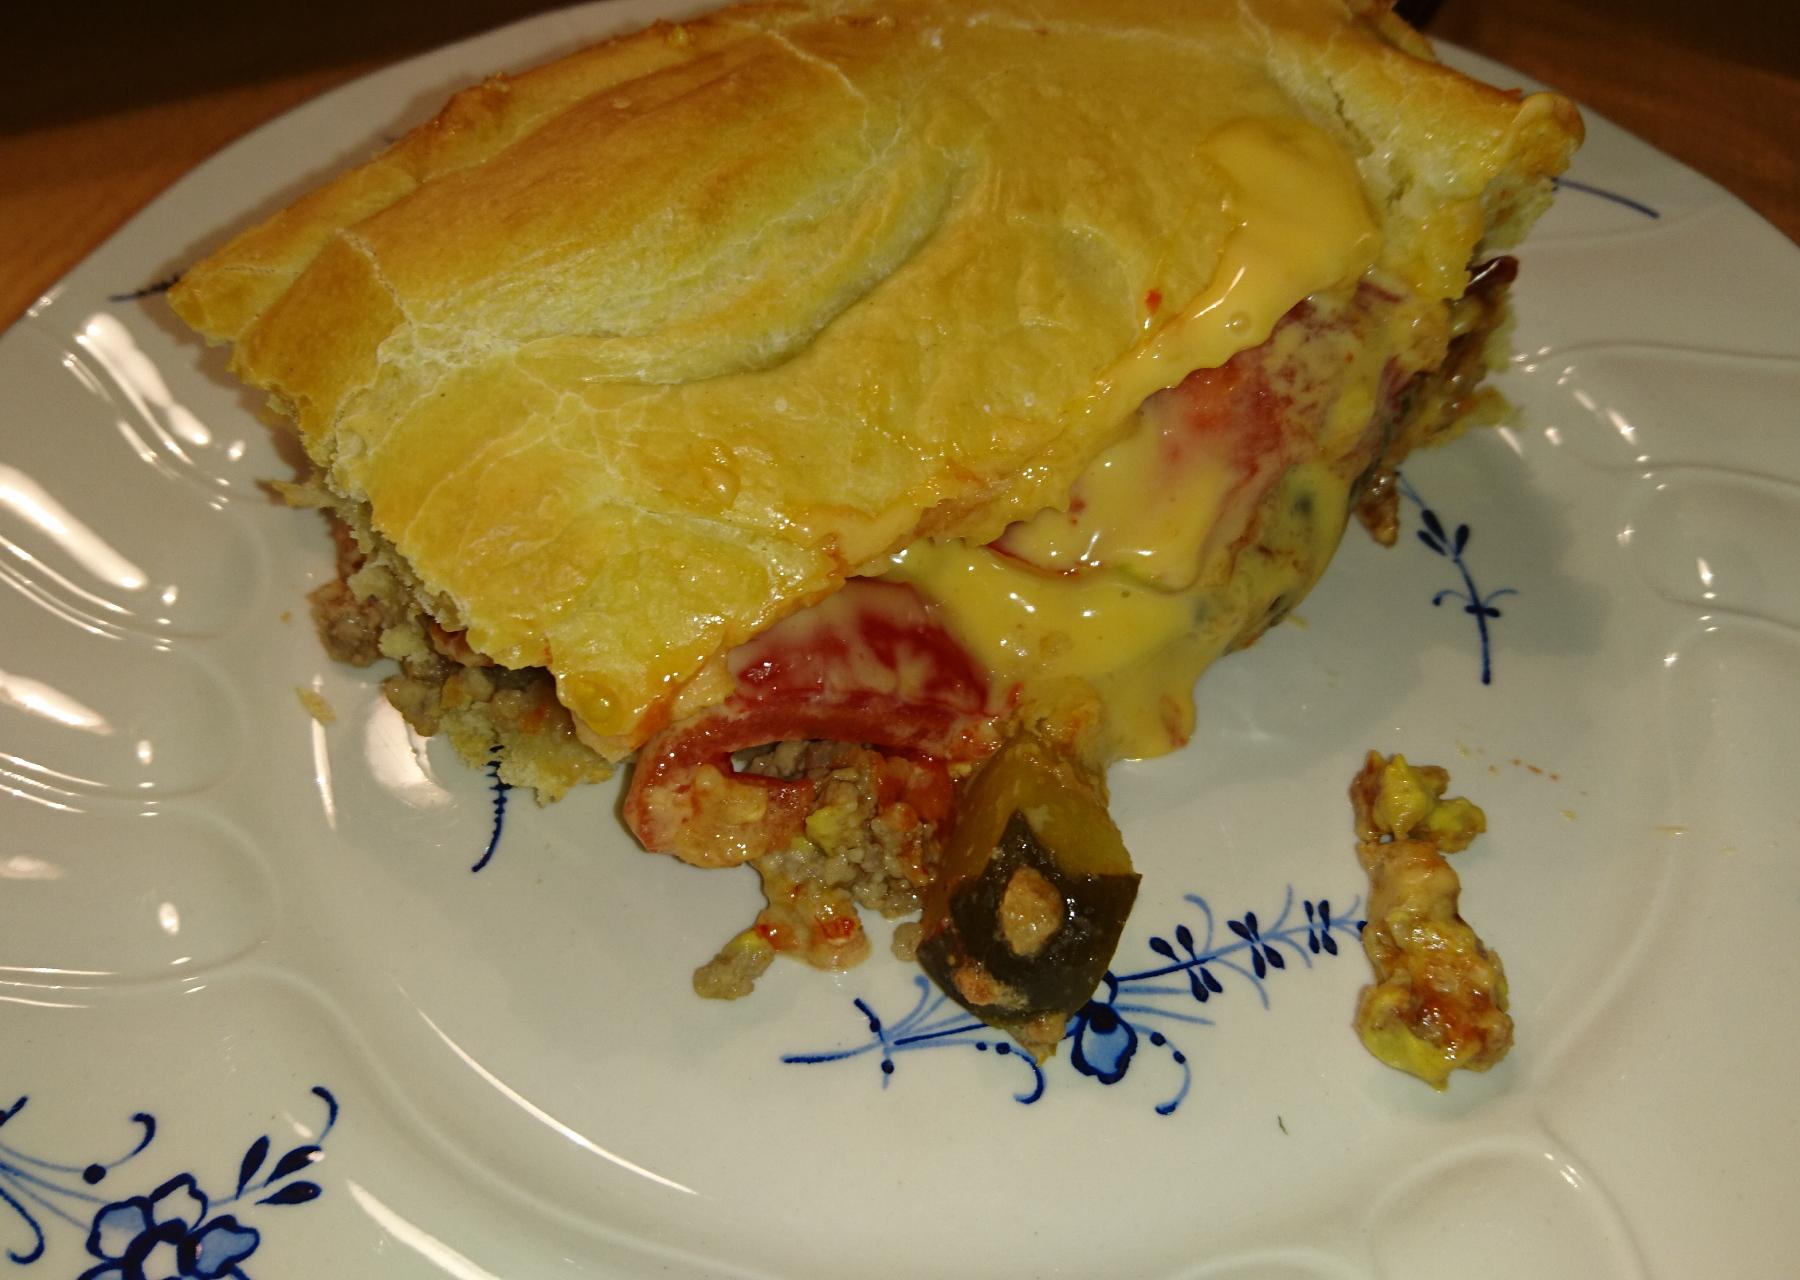 Cheeseburger-Kuchen aus der stilvollen Ofenhexe